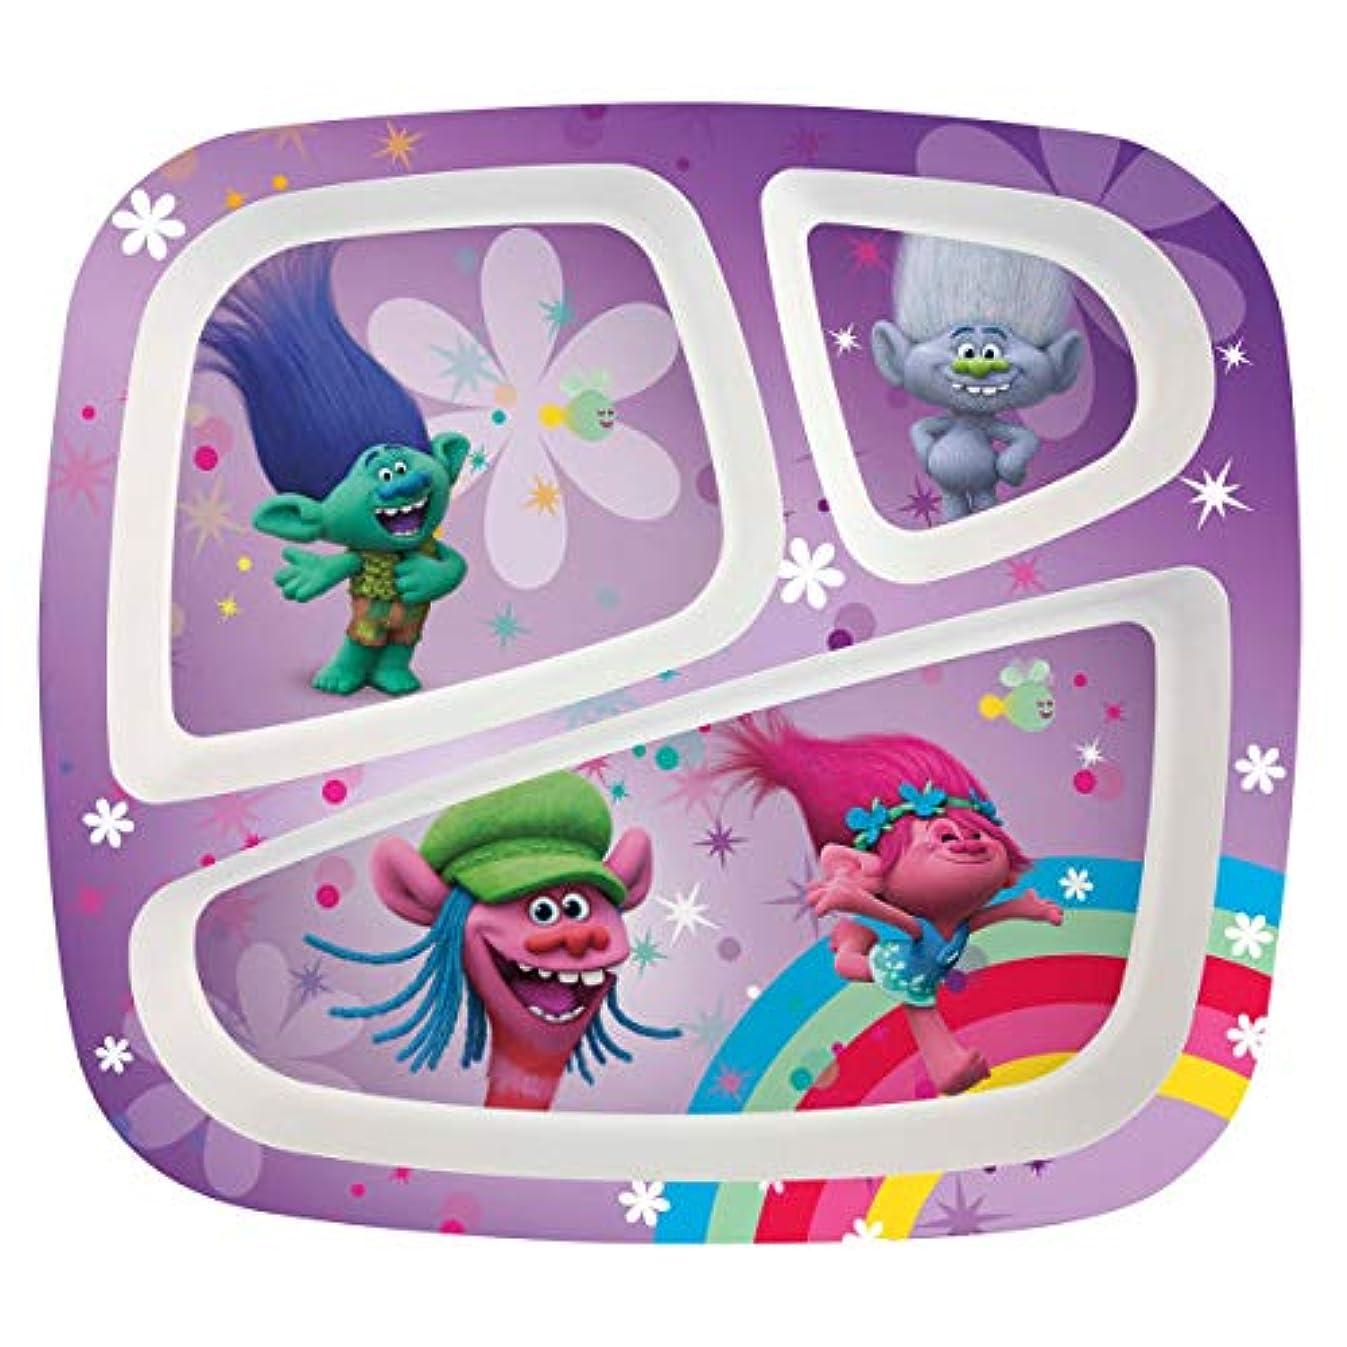 Zak Designs Trolls Movie 3-section Kids Plate, Poppy, Branch, Cooper & Guy Diamond